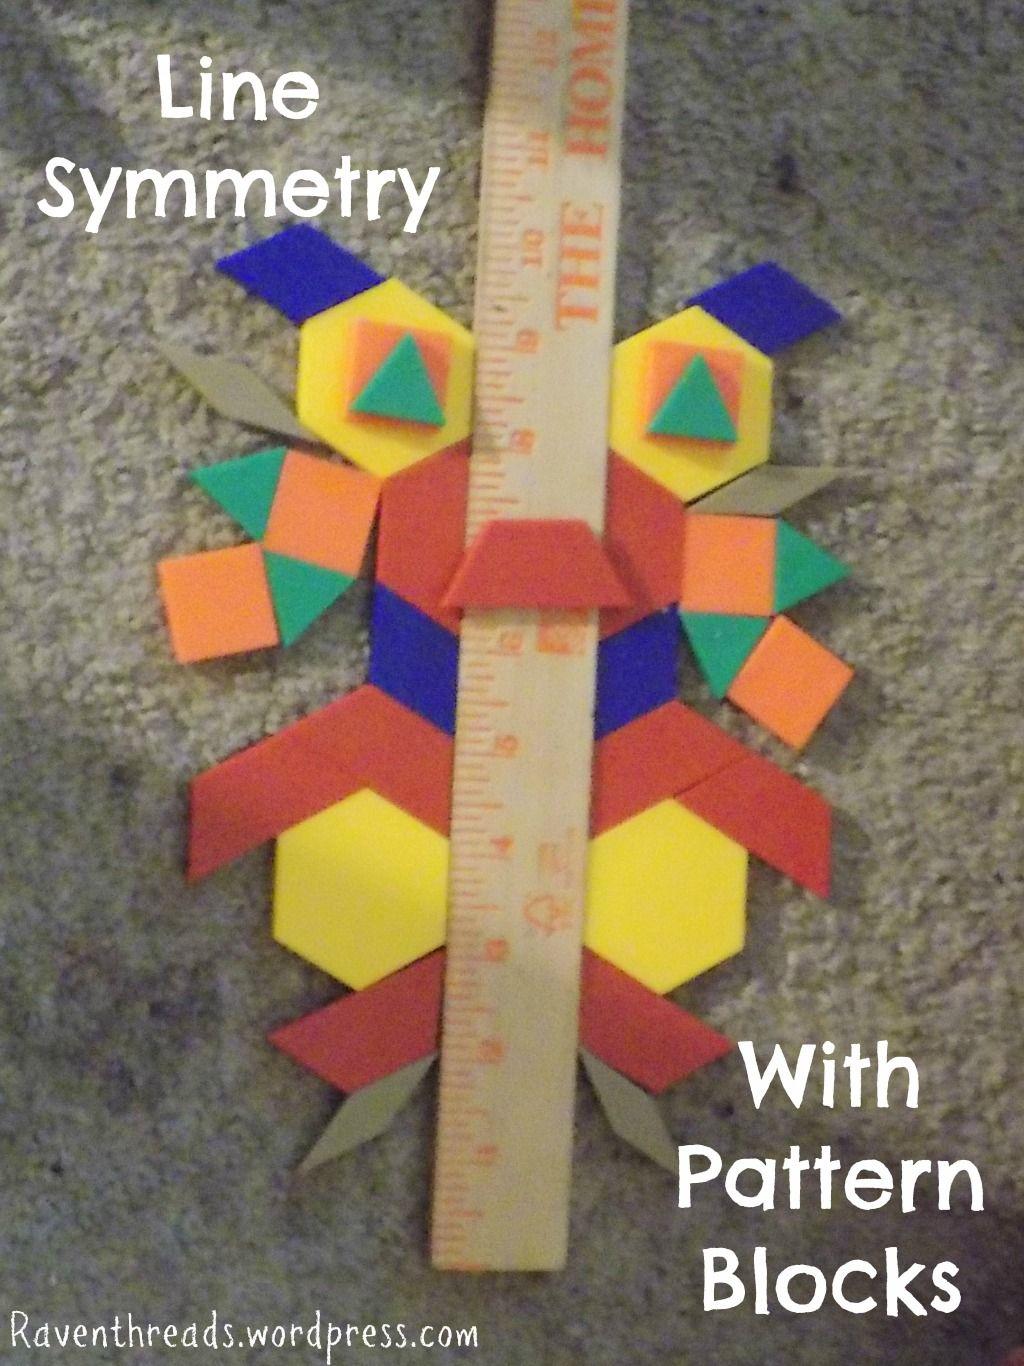 Line Symmetry With Pattern Blocks